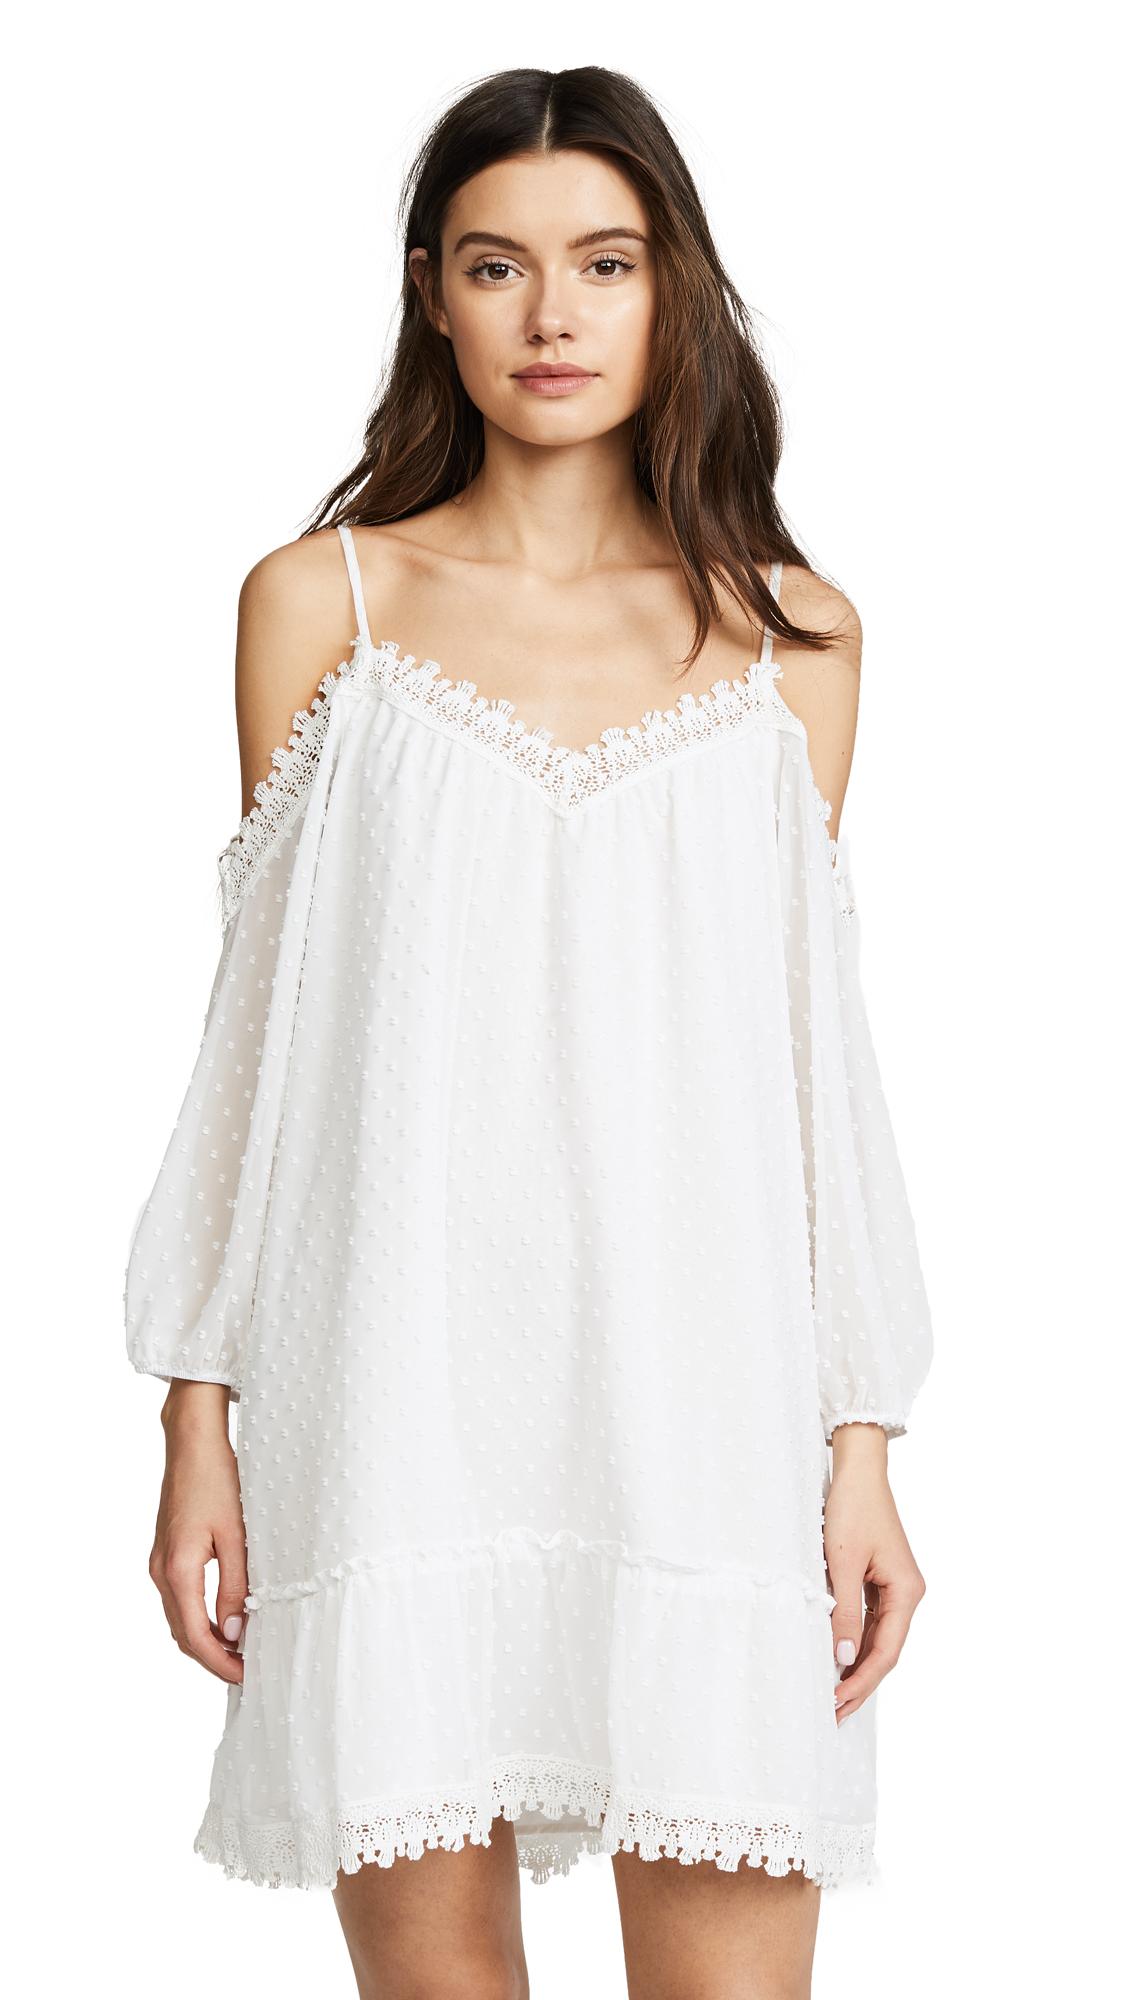 BB Dakota Millie Dress - Ivory